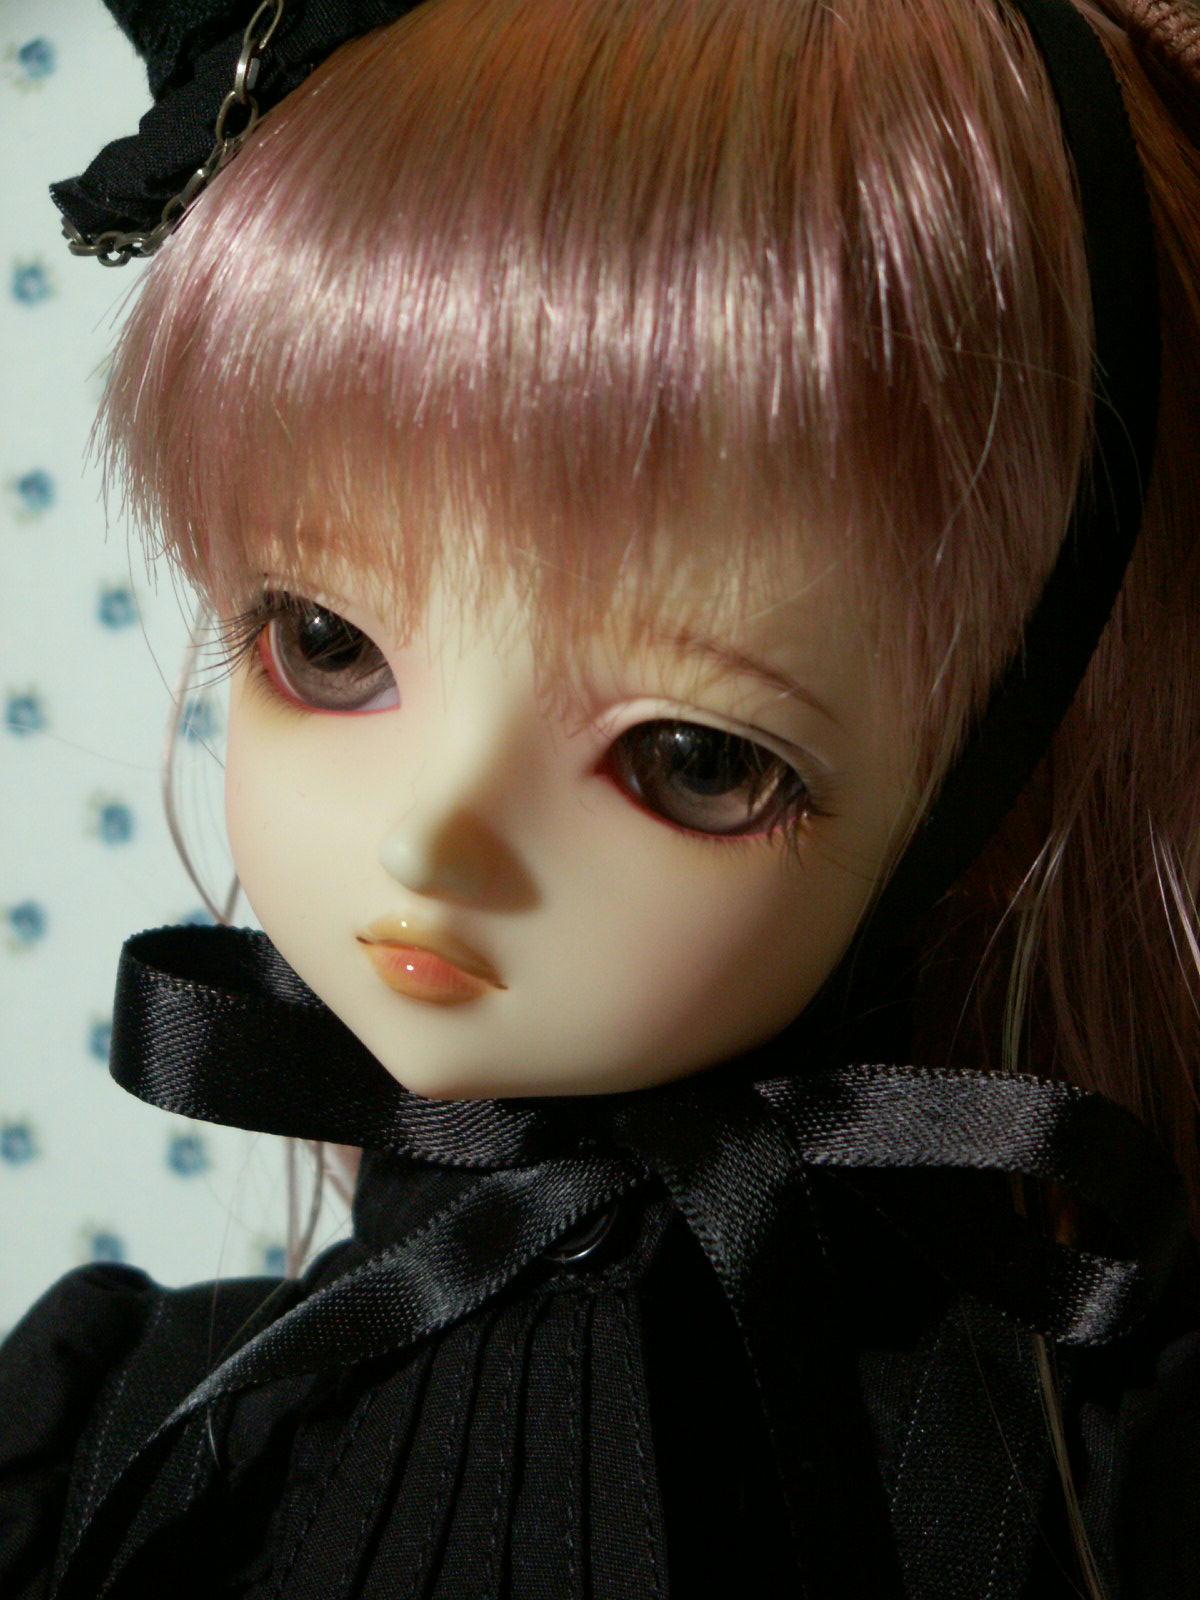 Pict0022